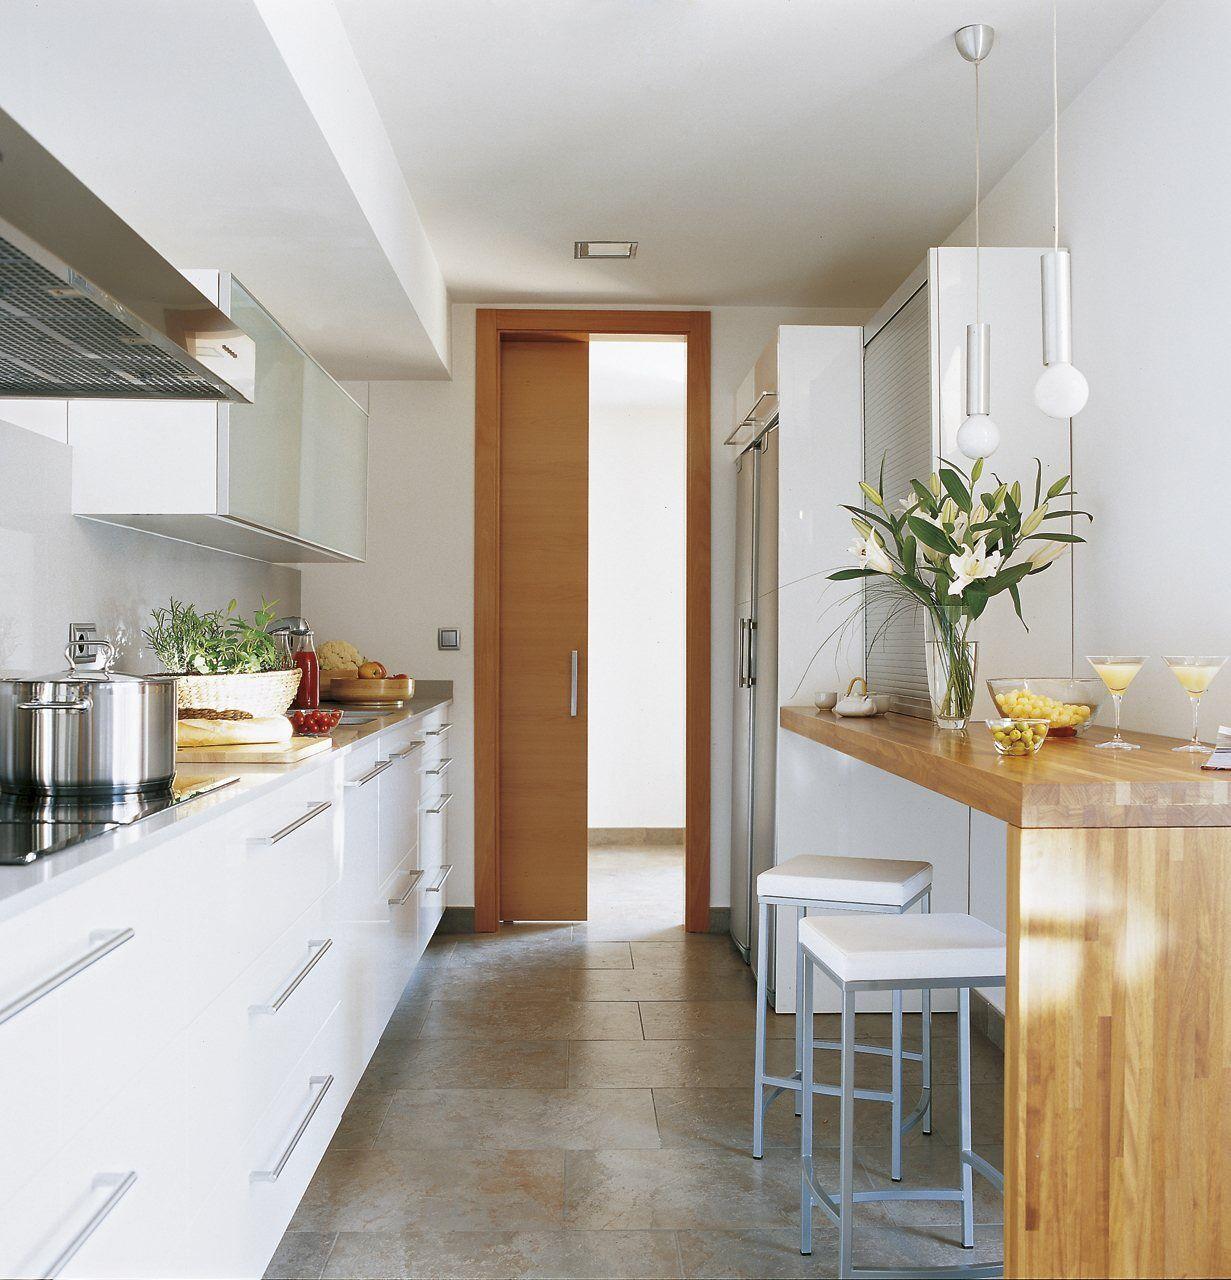 Rectangular cocina | Casita